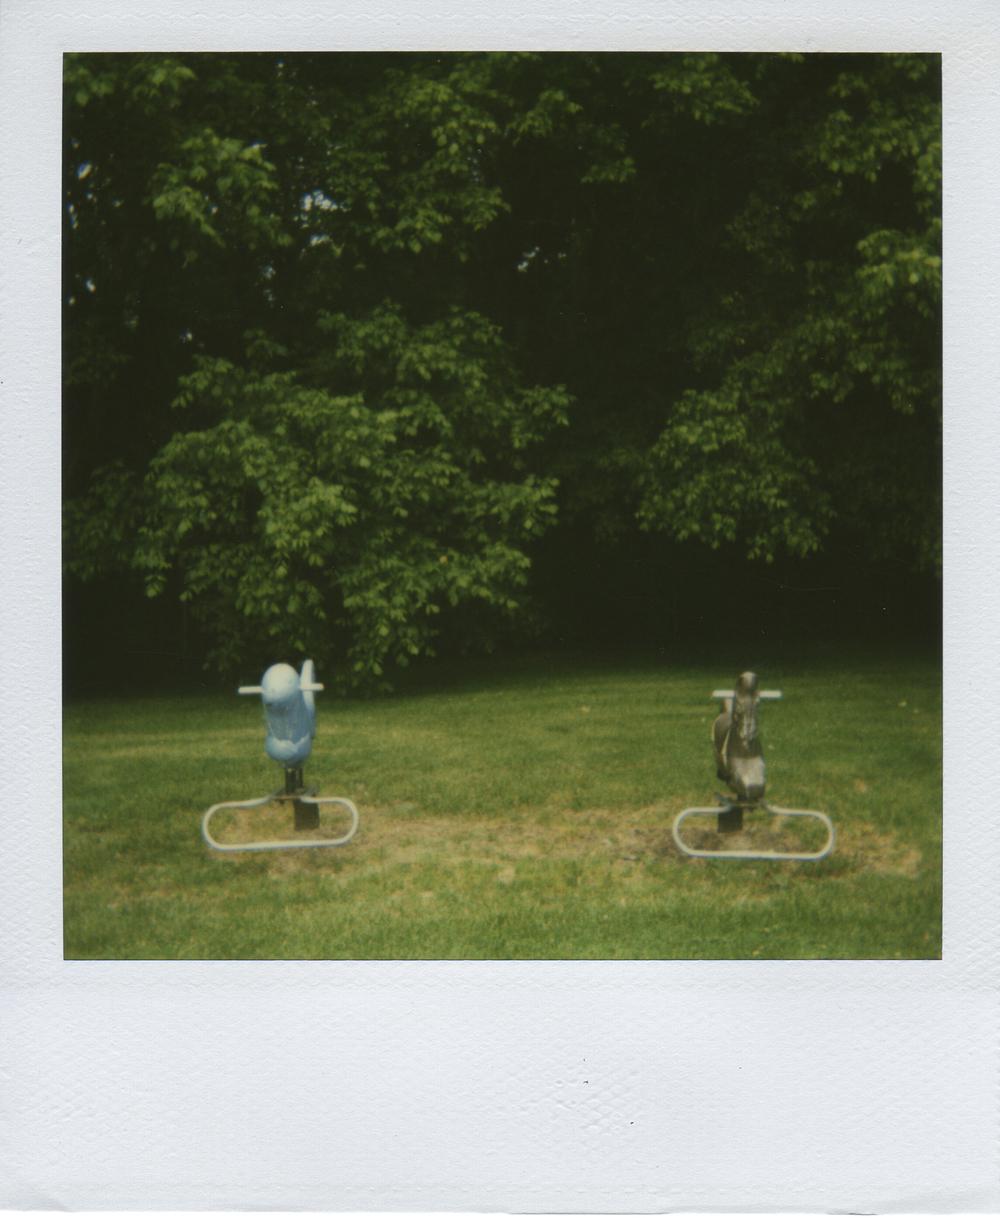 jlaurence-polaroid-078.jpg